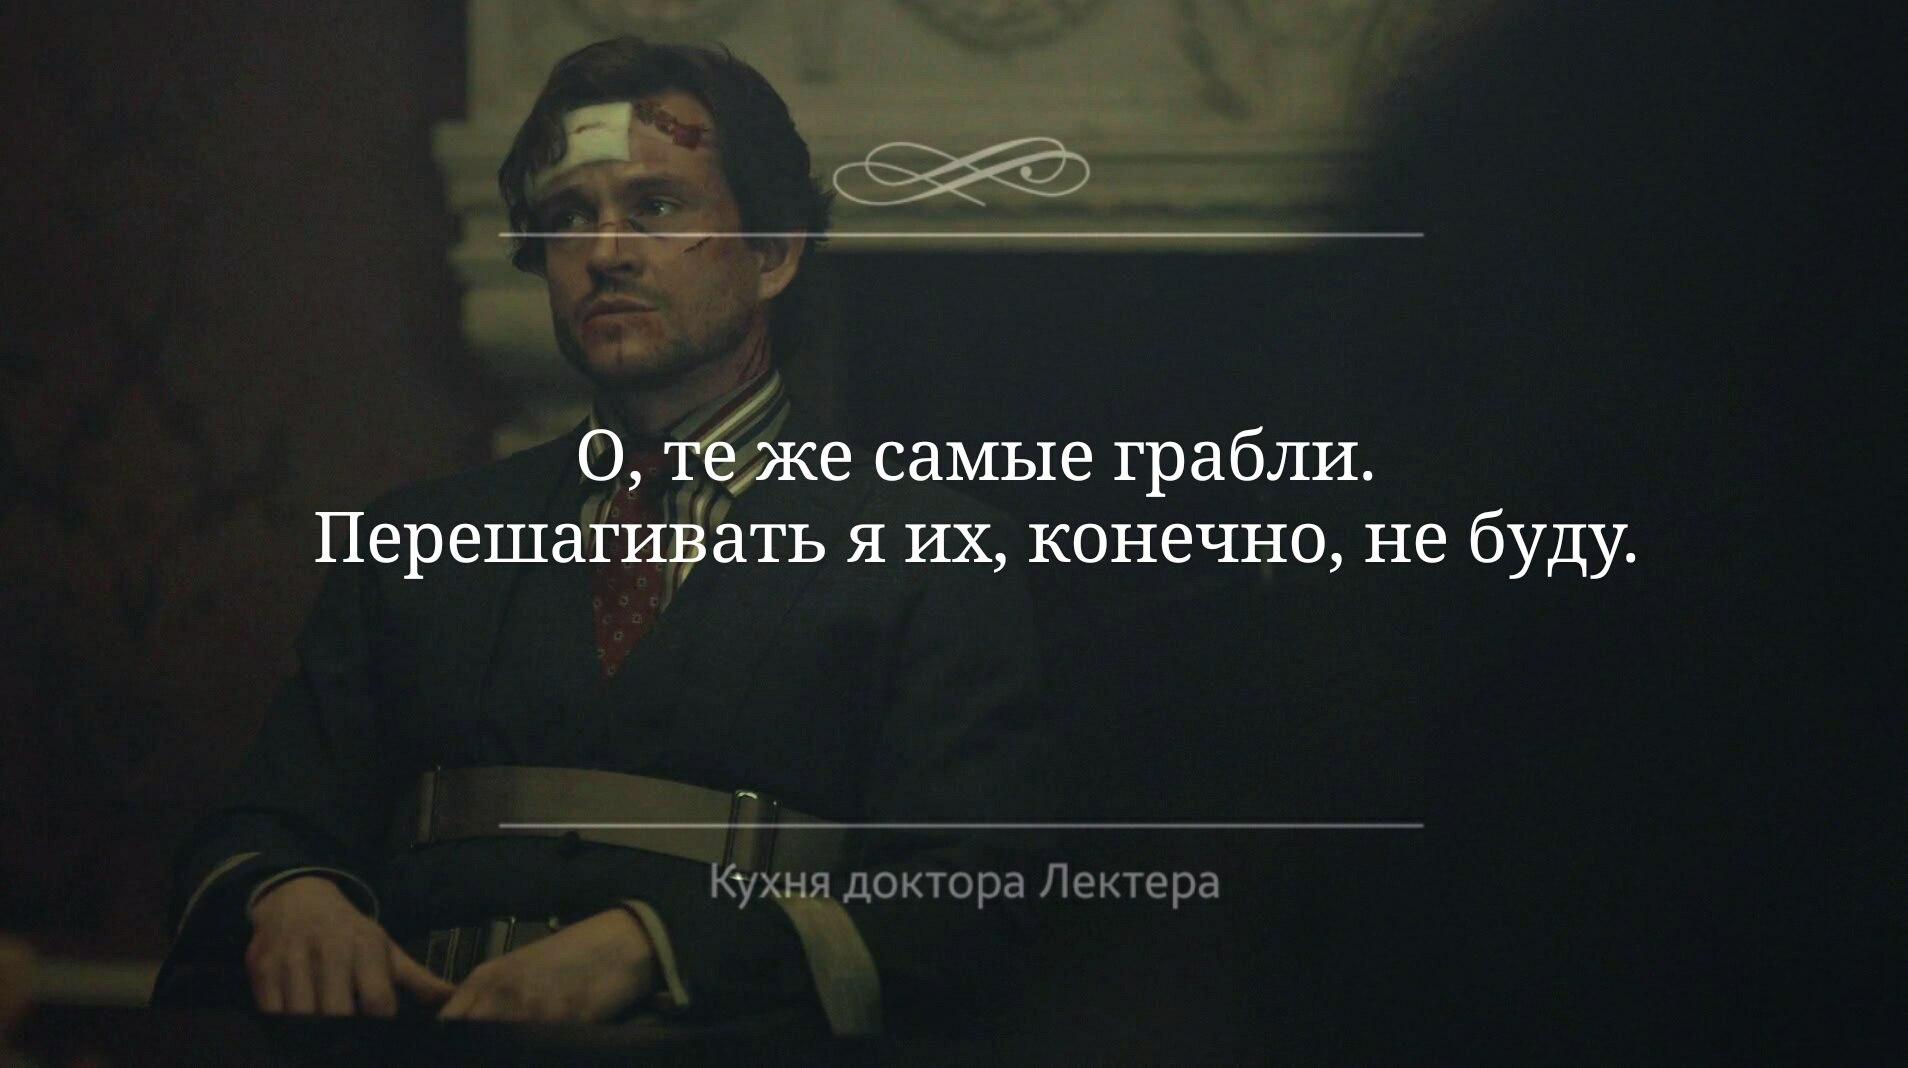 https://pp.userapi.com/c847216/v847216059/3358c/5tXBhYxWguc.jpg